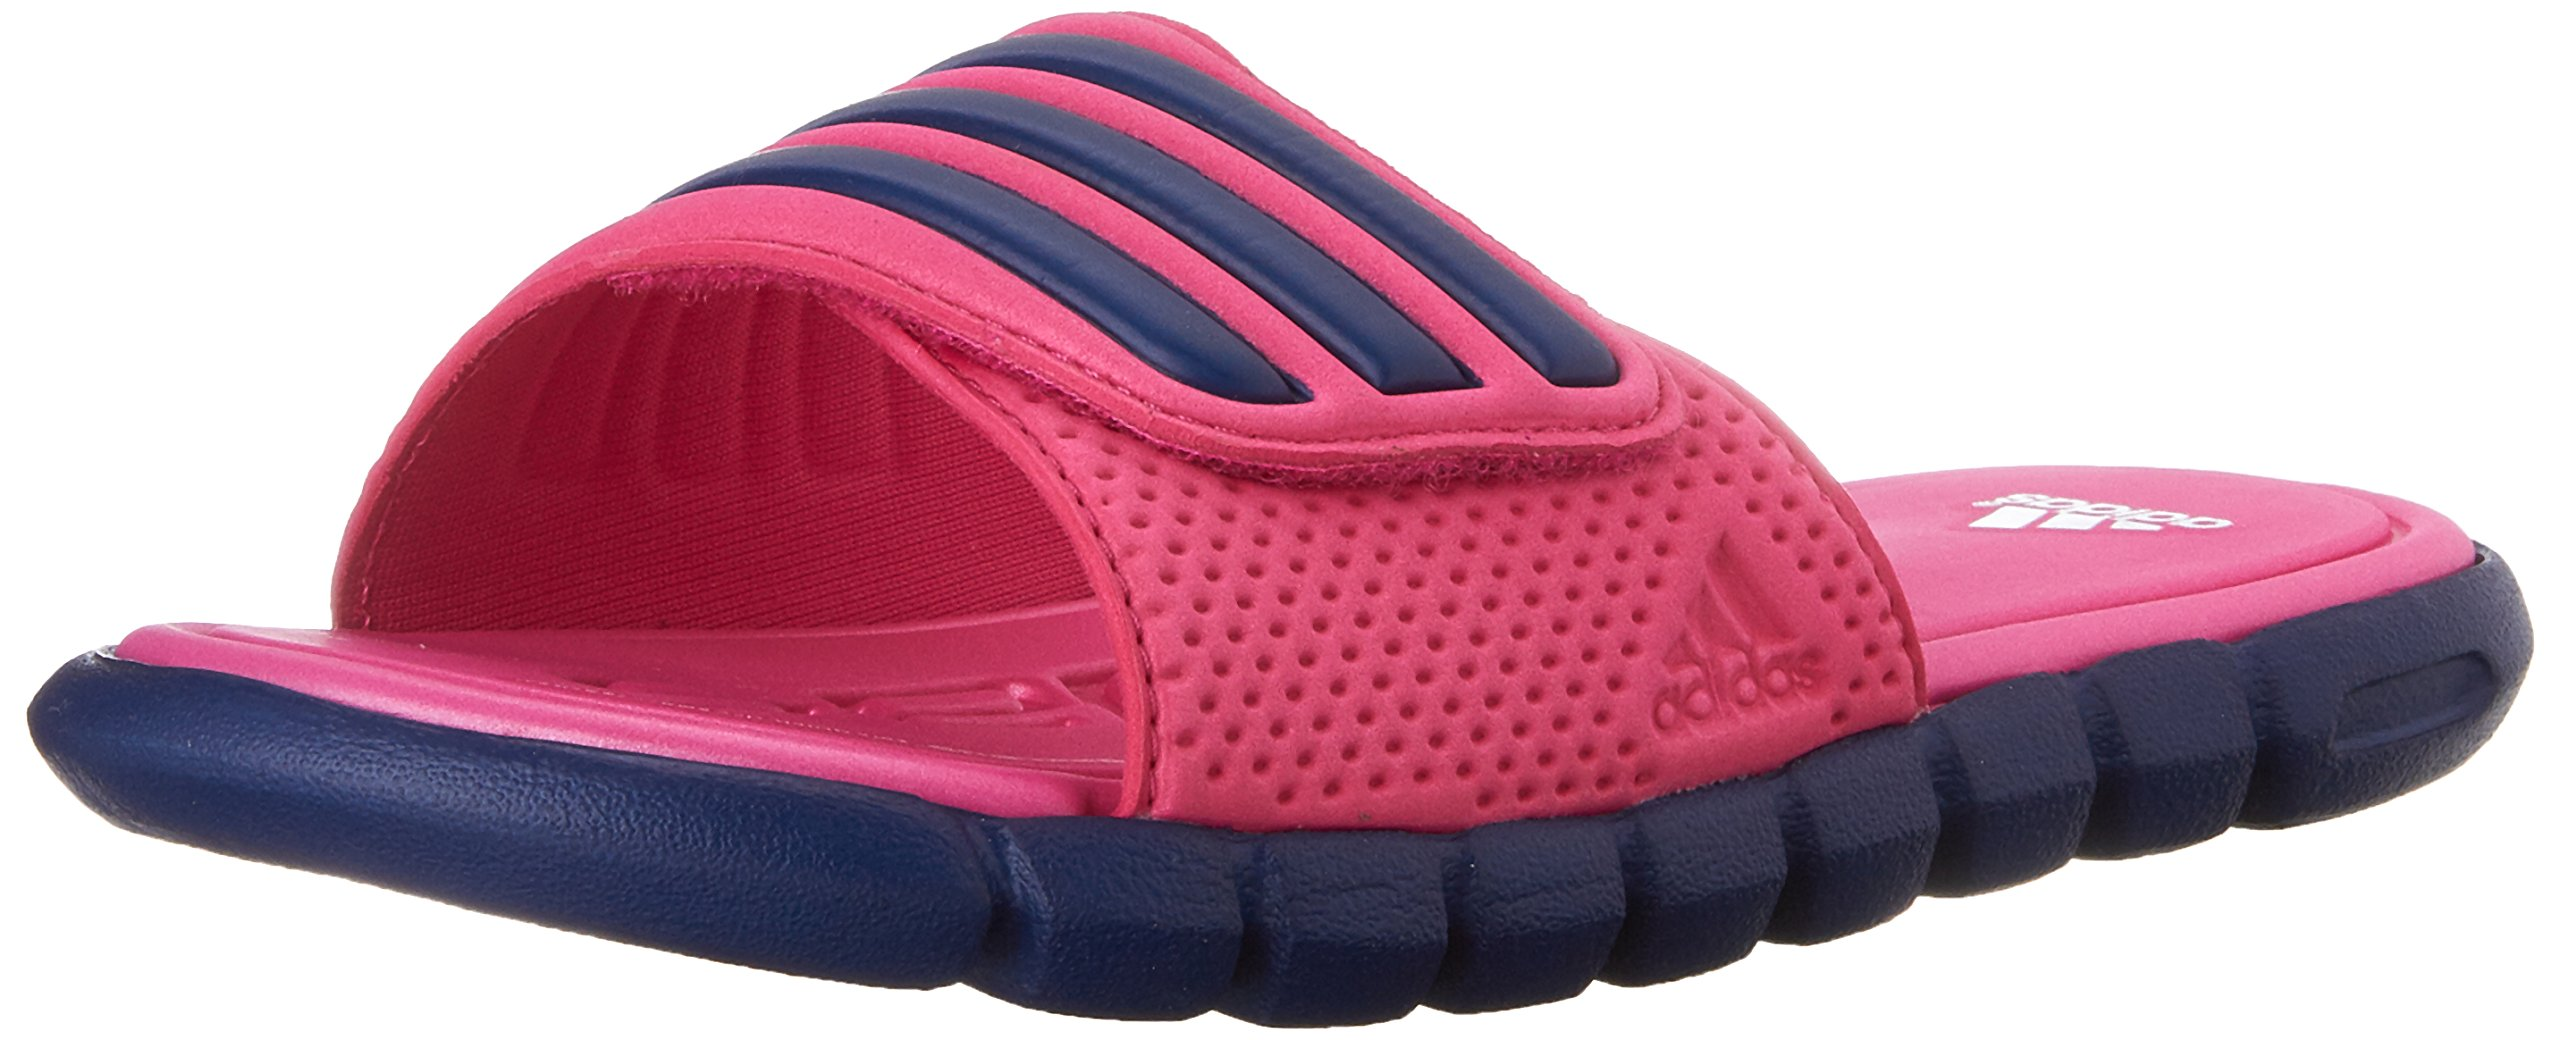 727c8b0679a919 Galleon - Adidas Performance Adilight SC XJ Slide Sandal (Little Kid Big Kid)